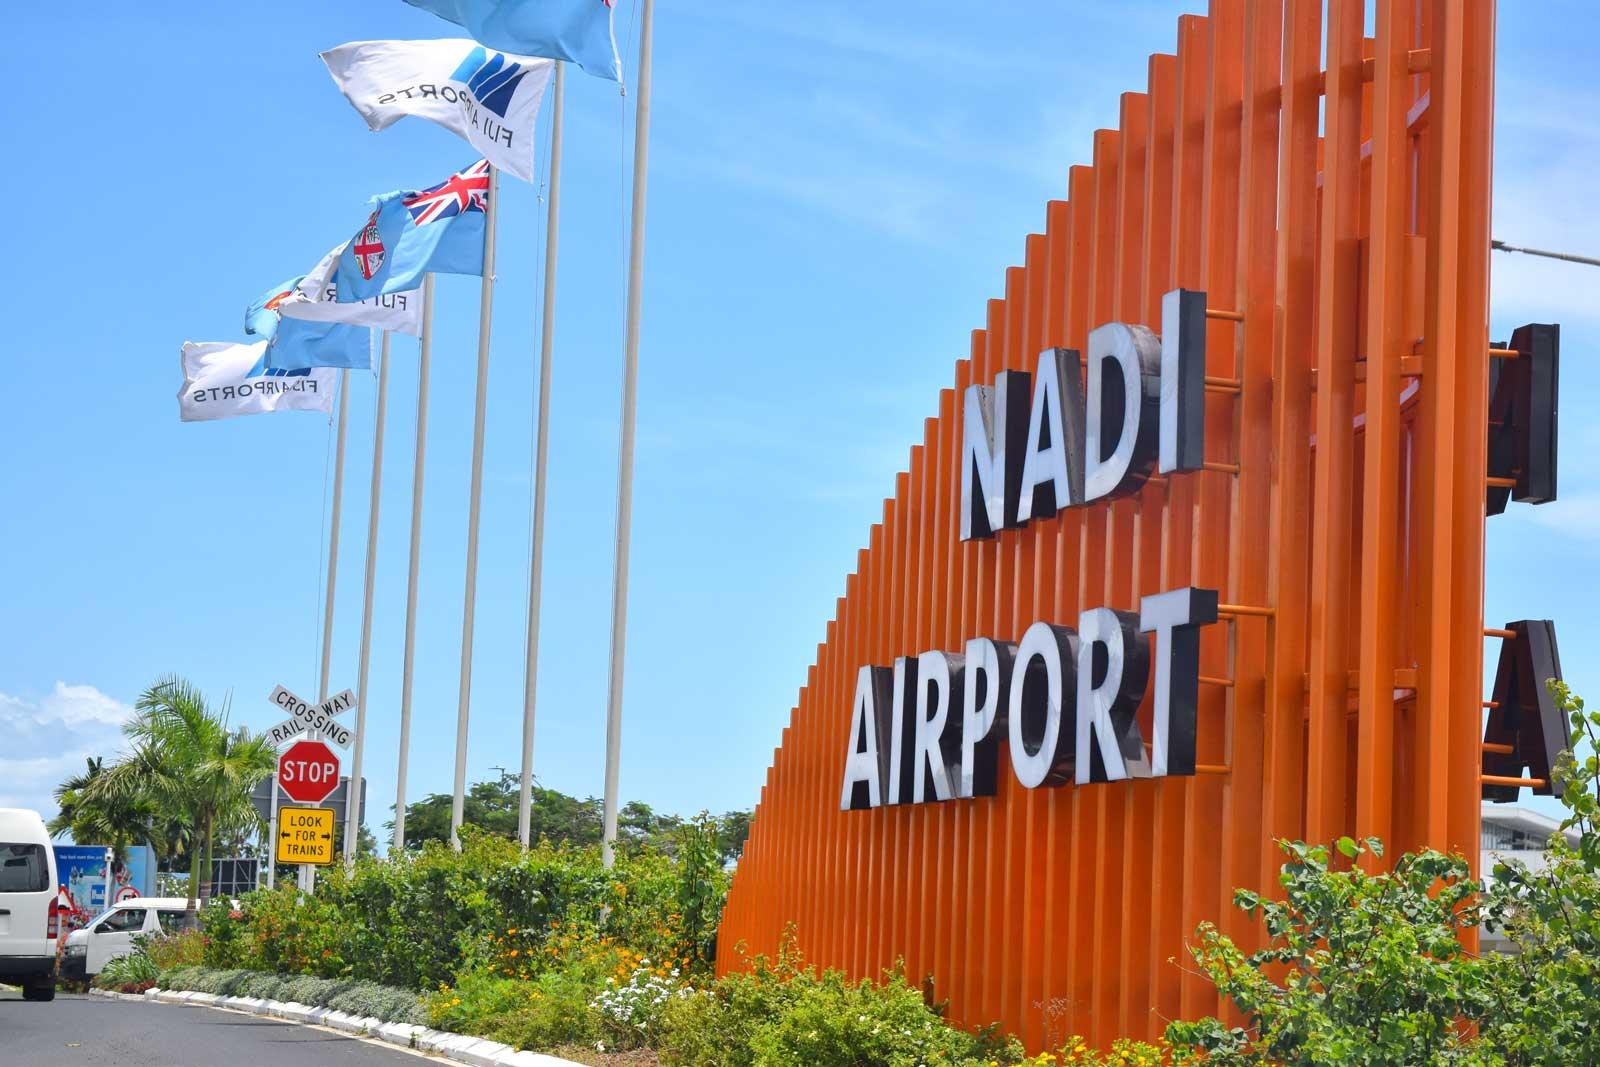 HEADER-The-cheapest-airport-transfers-in-Fiji-Credit-fijipocketguide.com